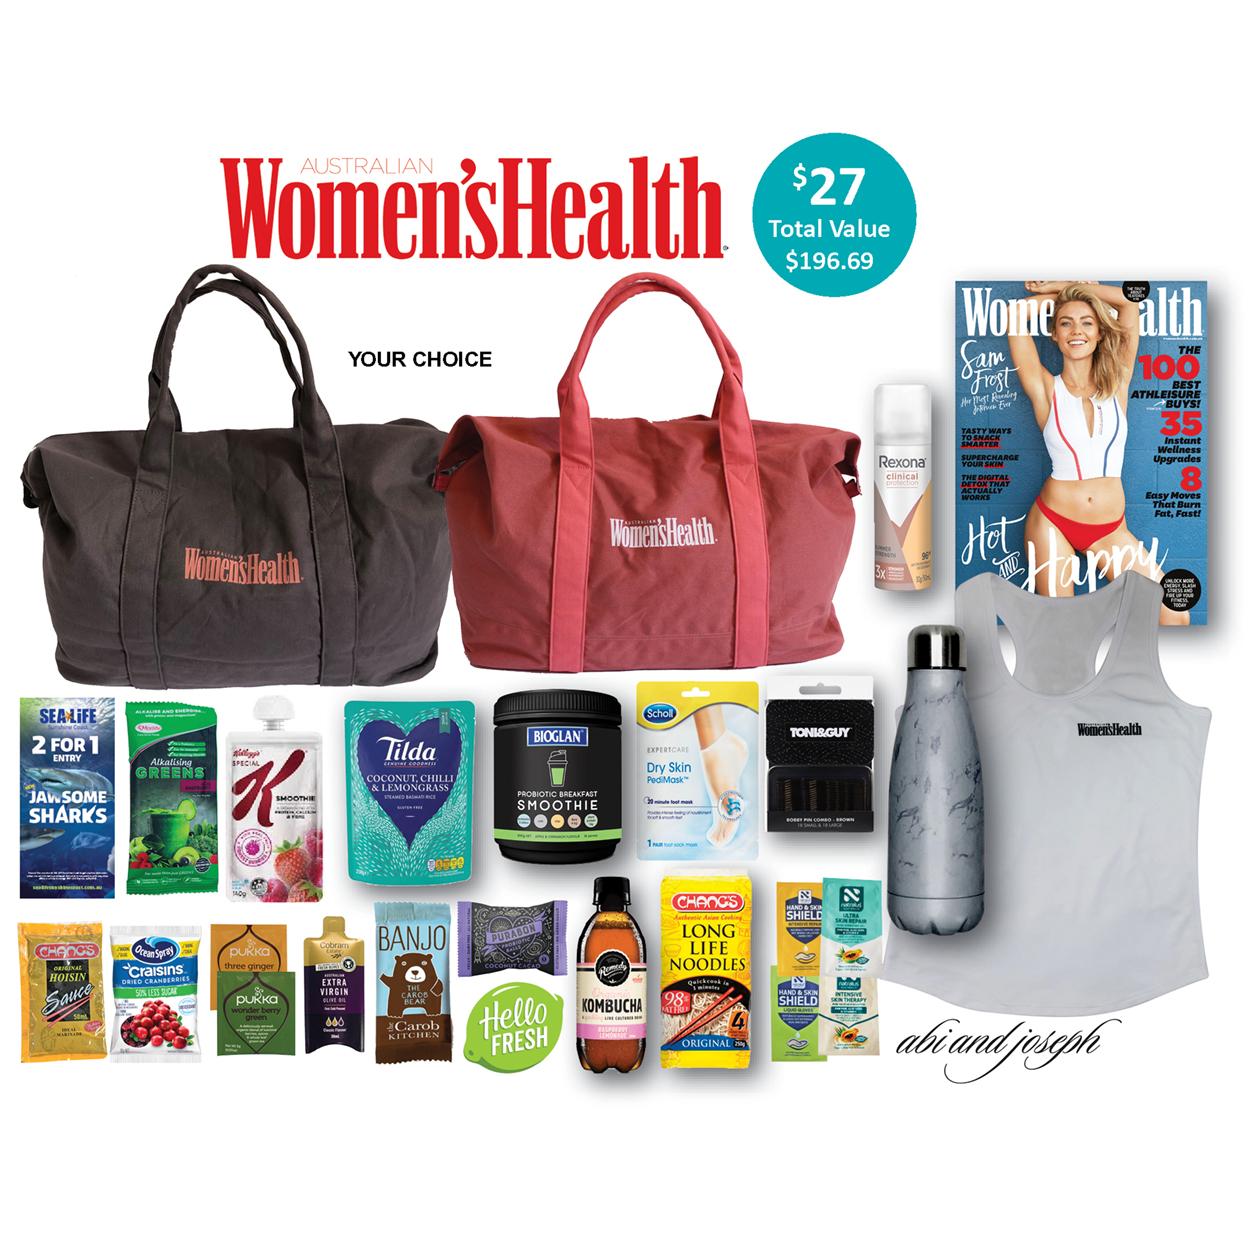 Women's Health Showbag - Brisbane 2019